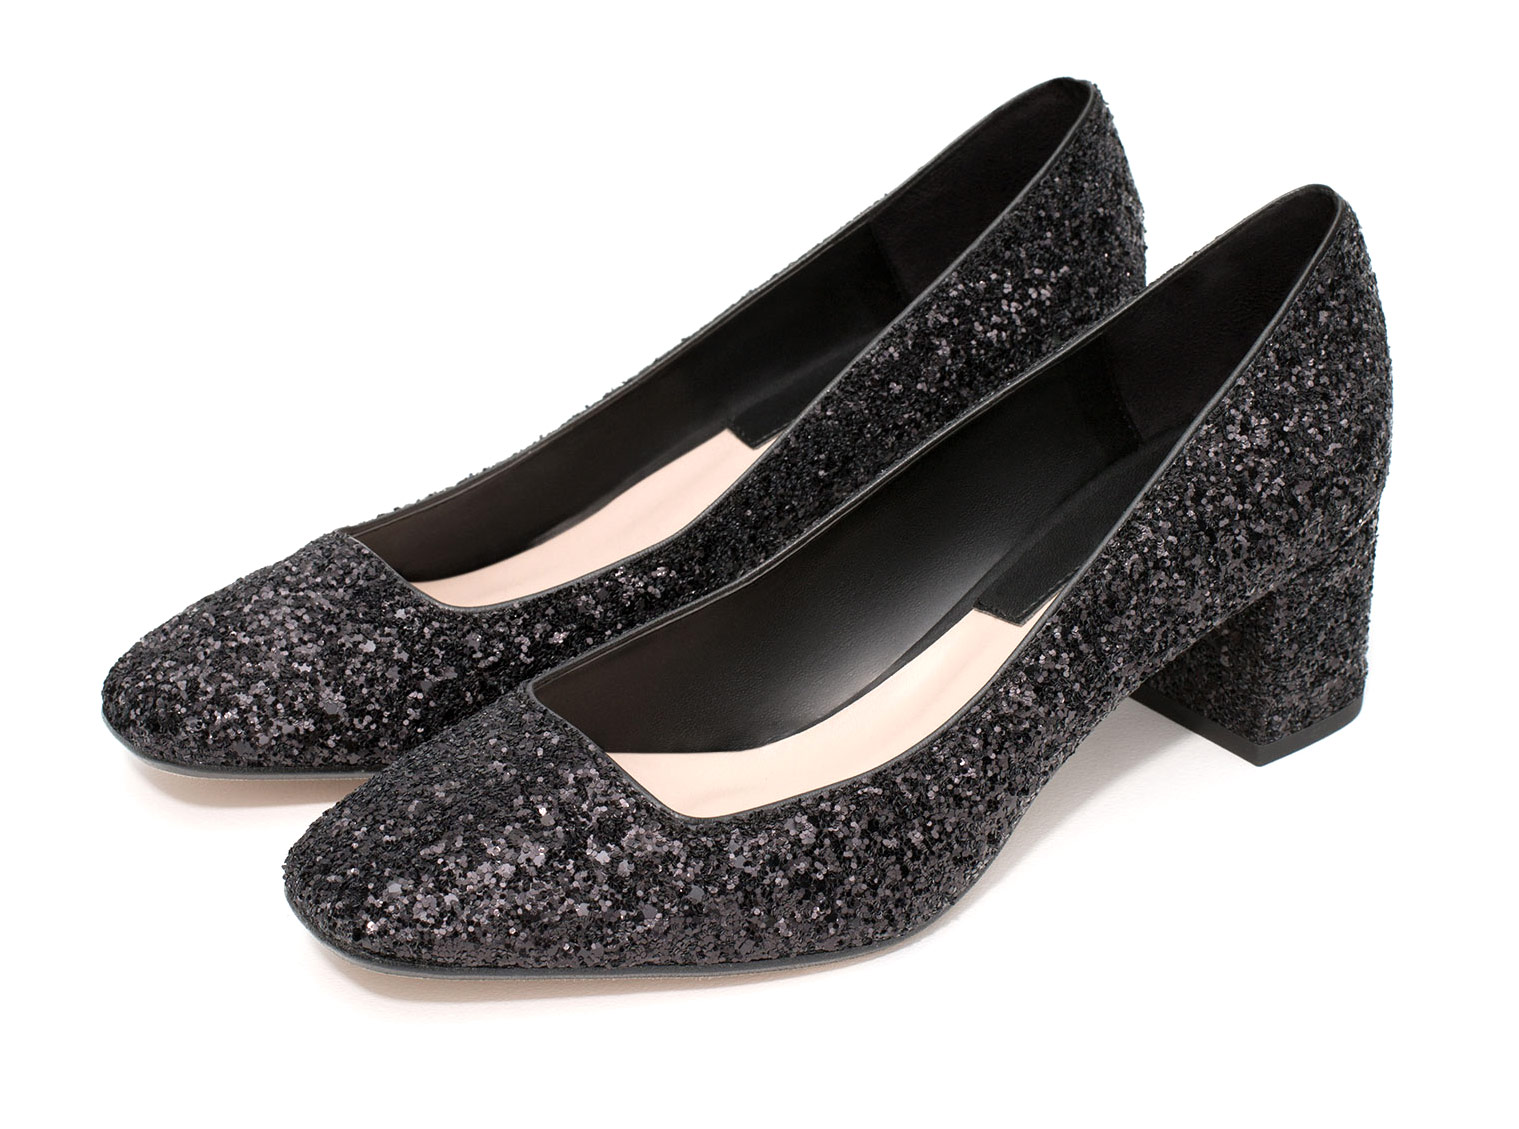 zara_gliietr_shoes_balck